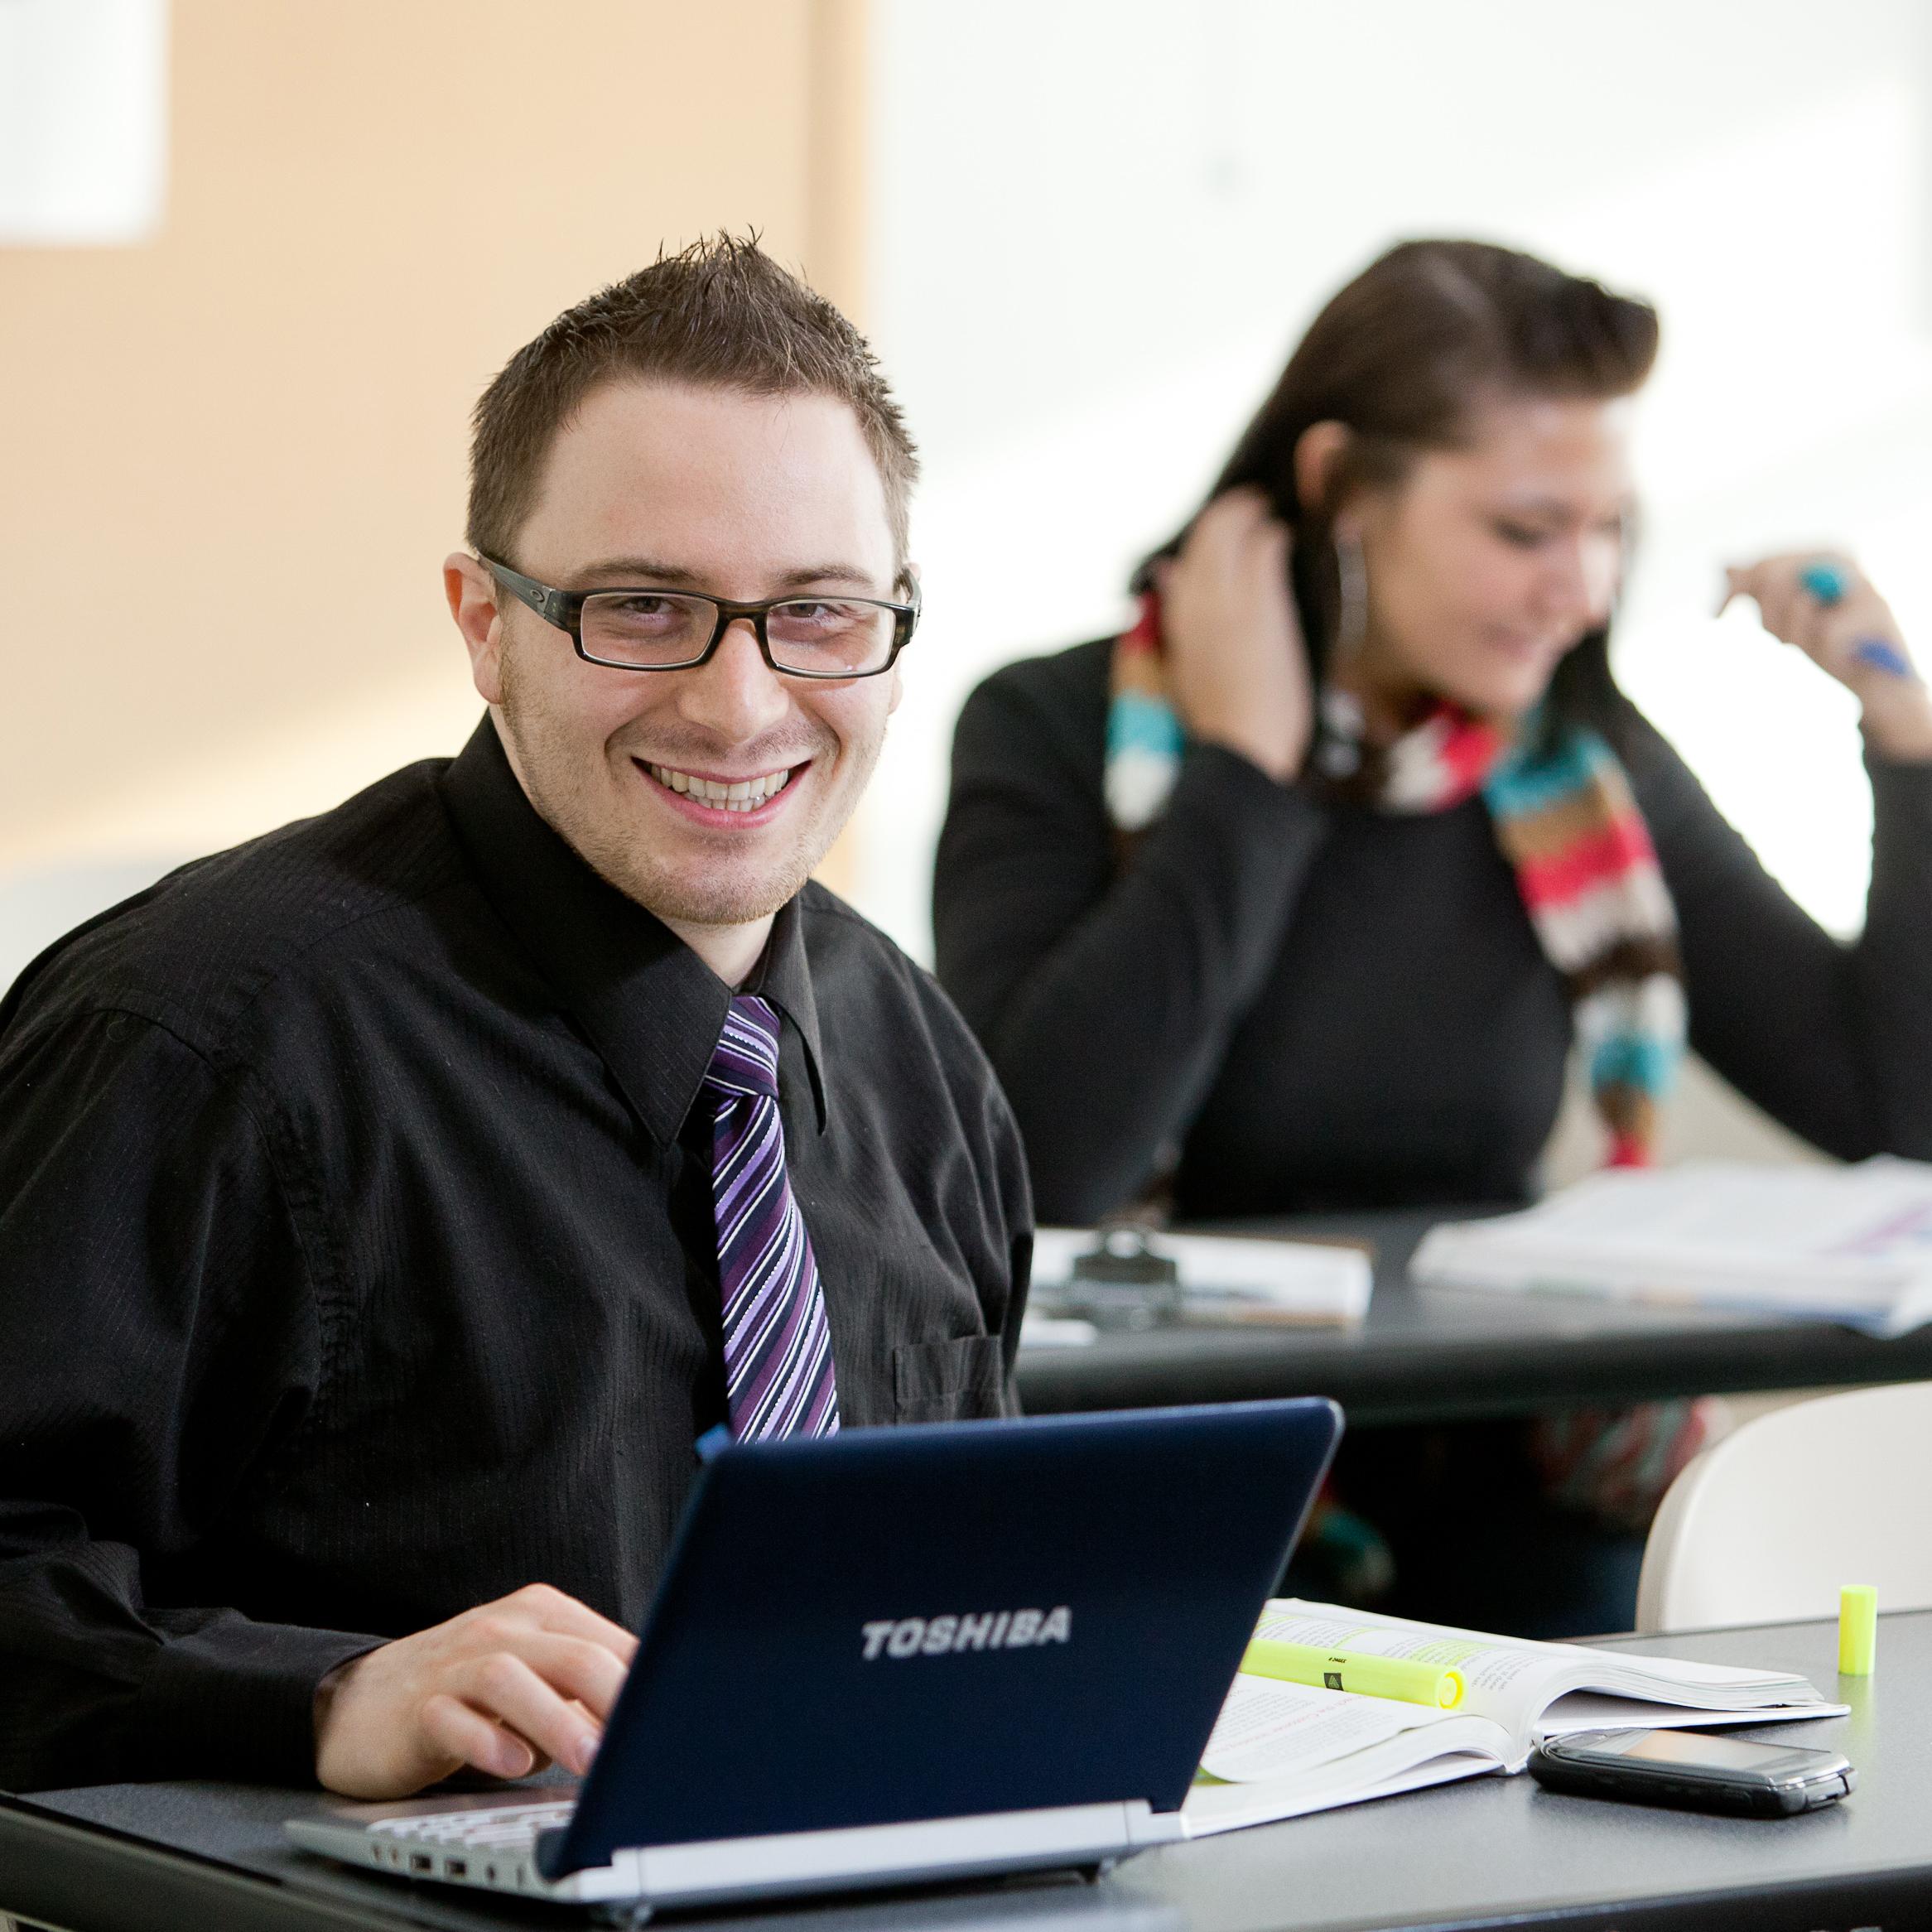 Man in tie typing on keyboard.